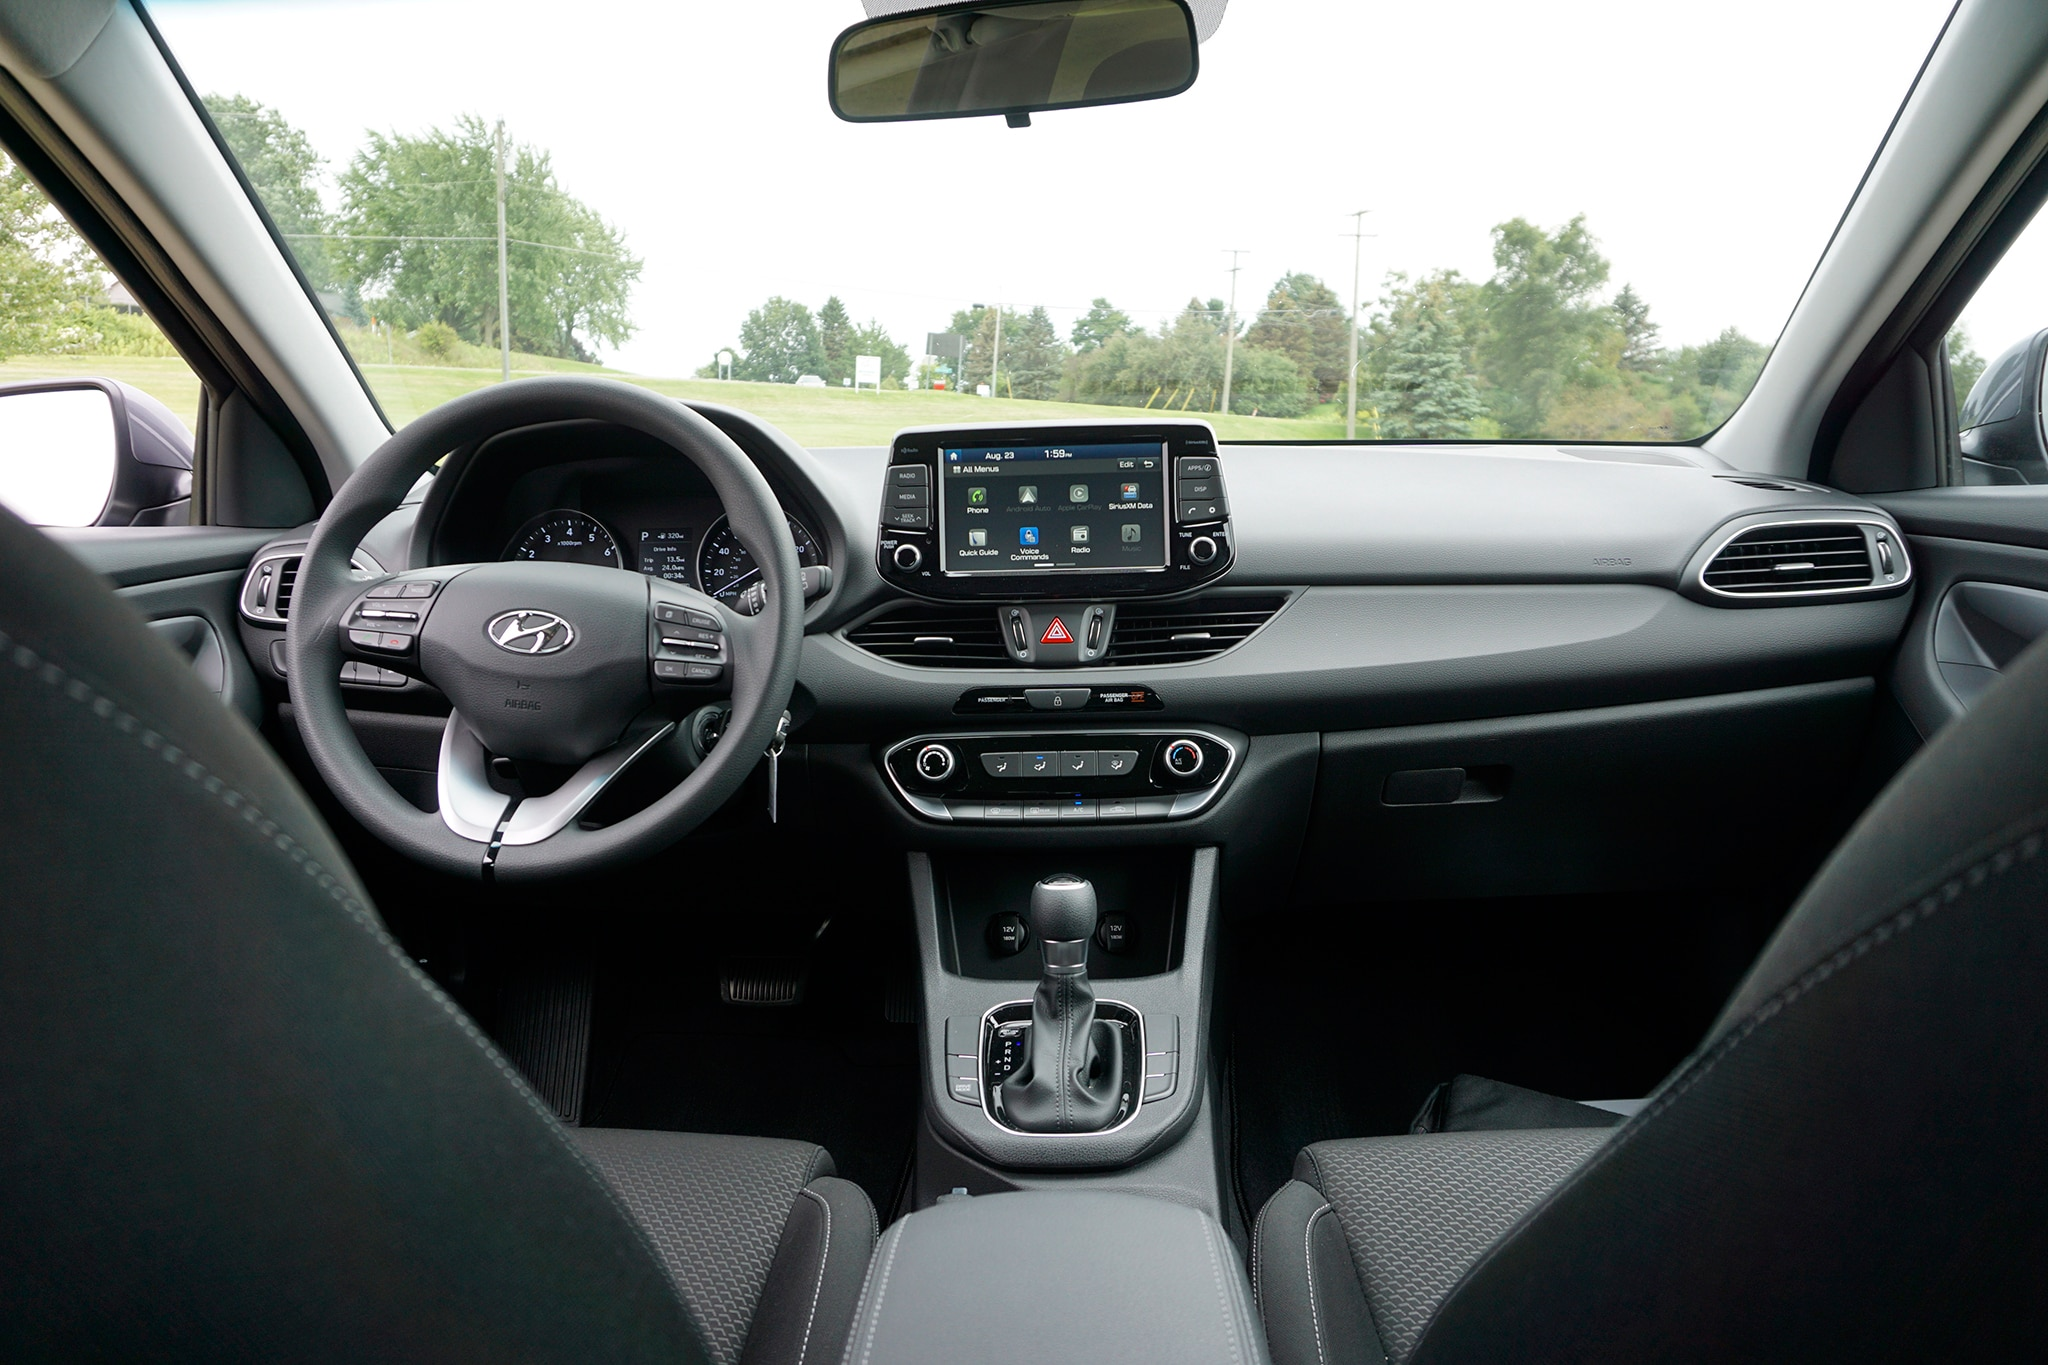 2018-Hyundai-Elantra-GT-cabin.jpg